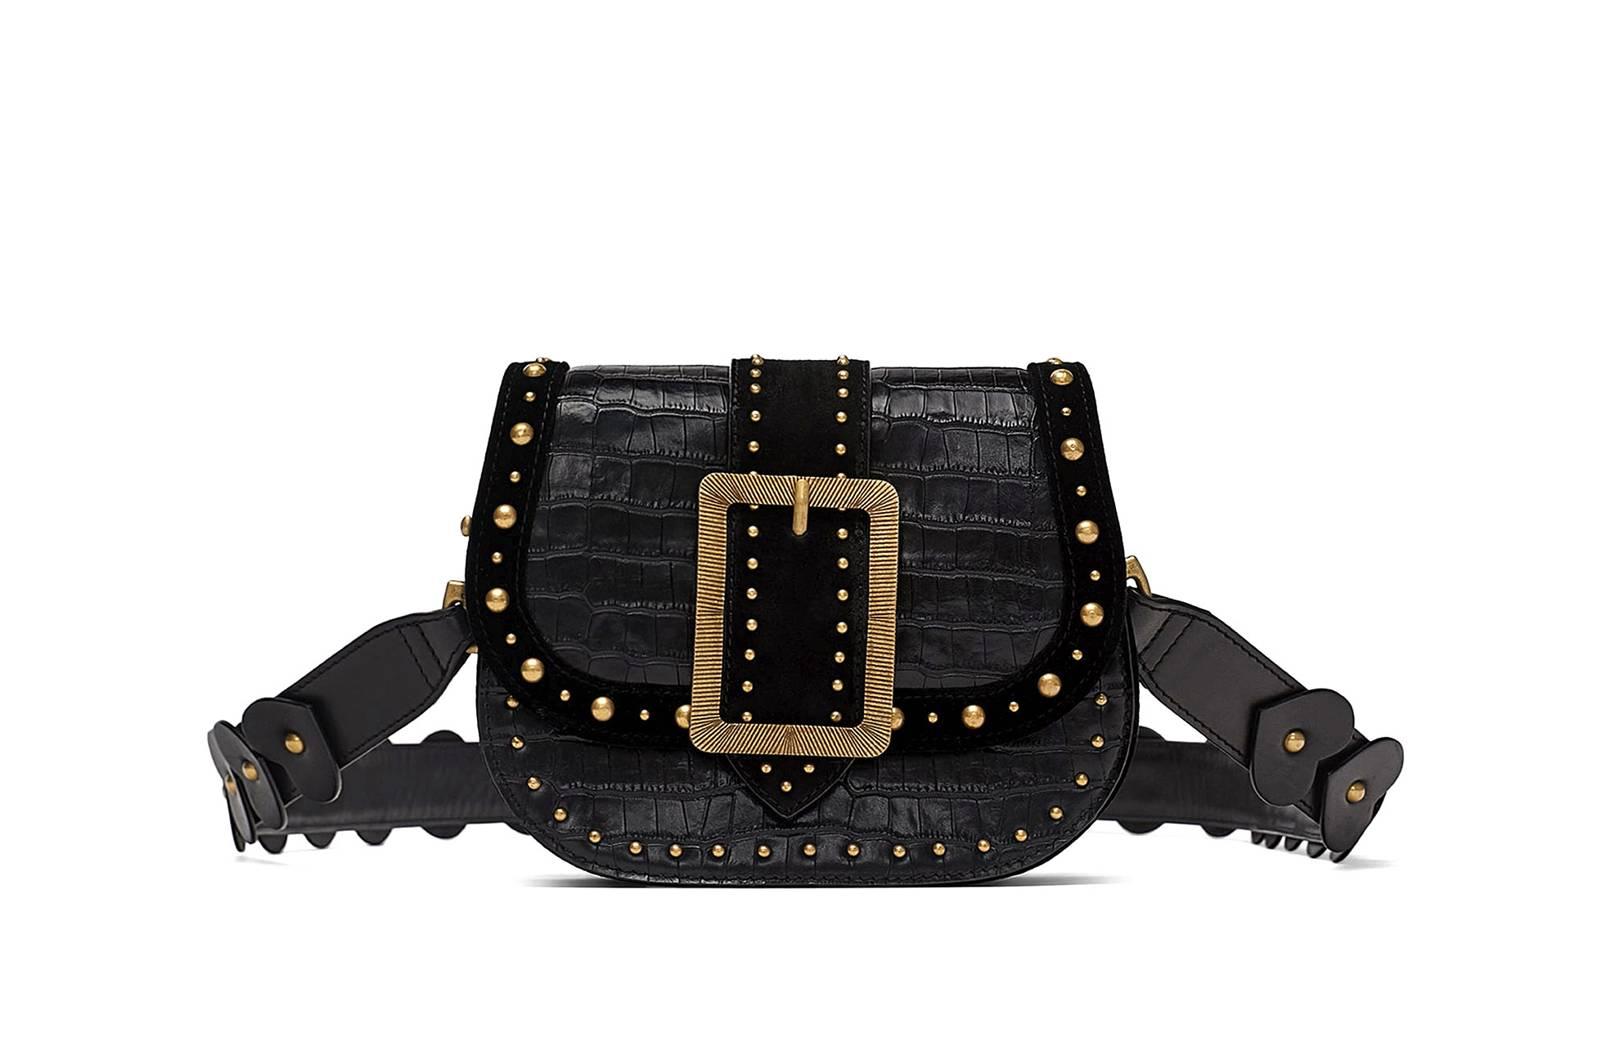 eb23a1aeb7 Crossbody Bags For Women